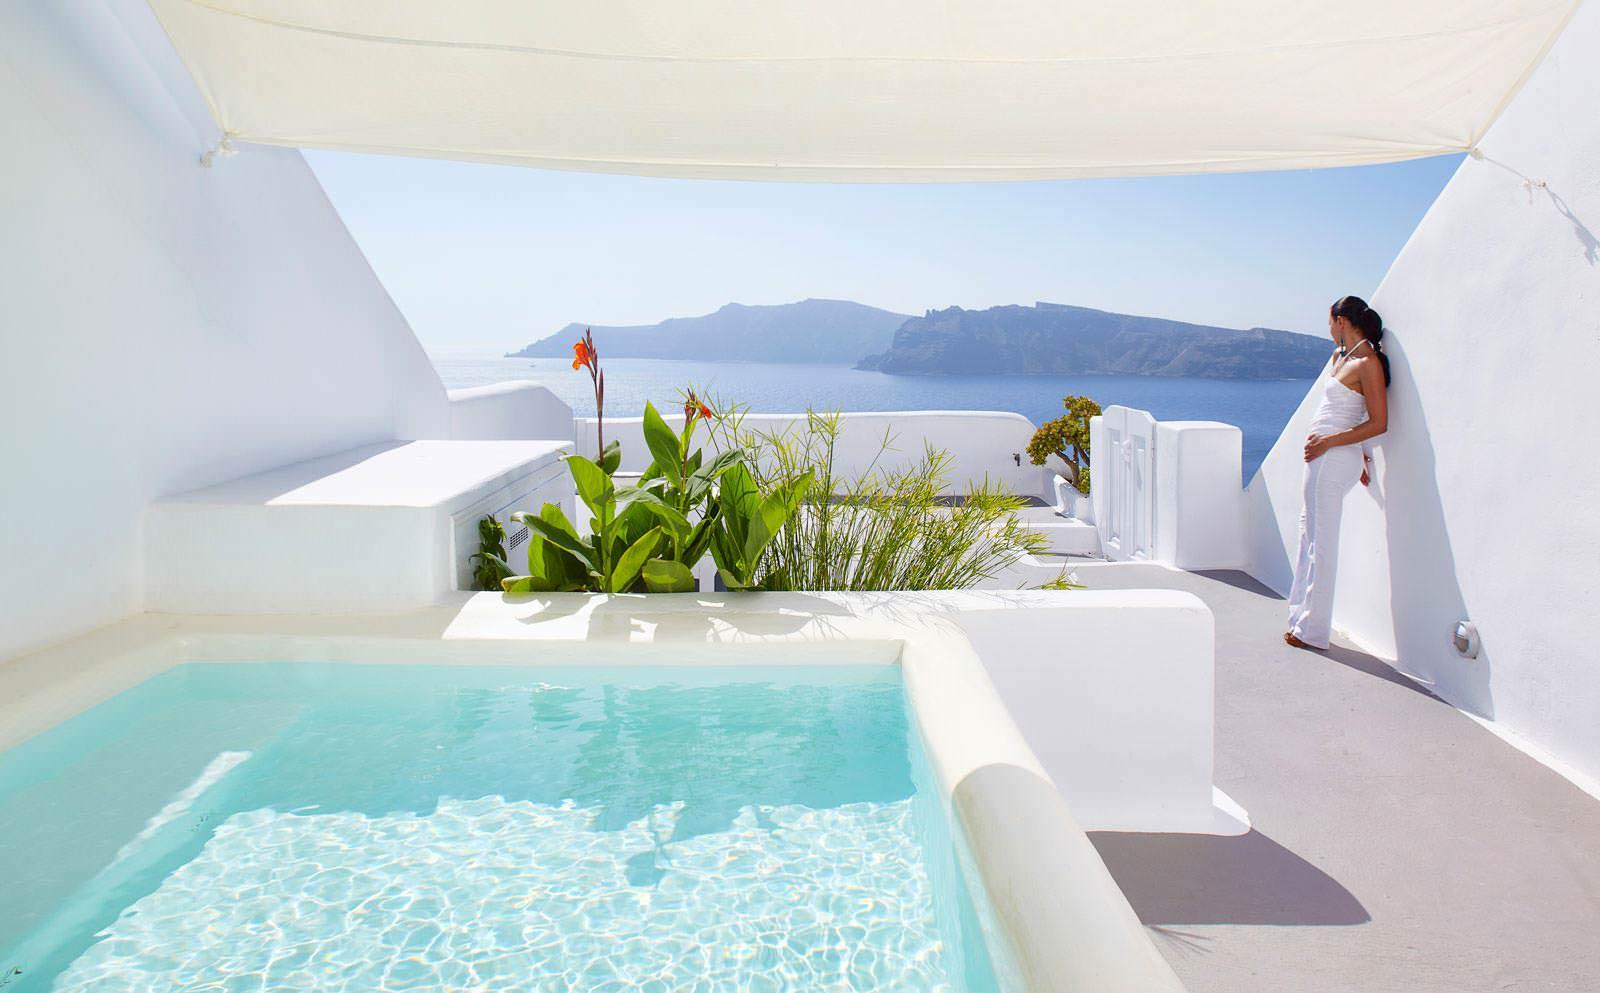 kirini boutique hotel oia santorini tailor made holidays to greece. Black Bedroom Furniture Sets. Home Design Ideas